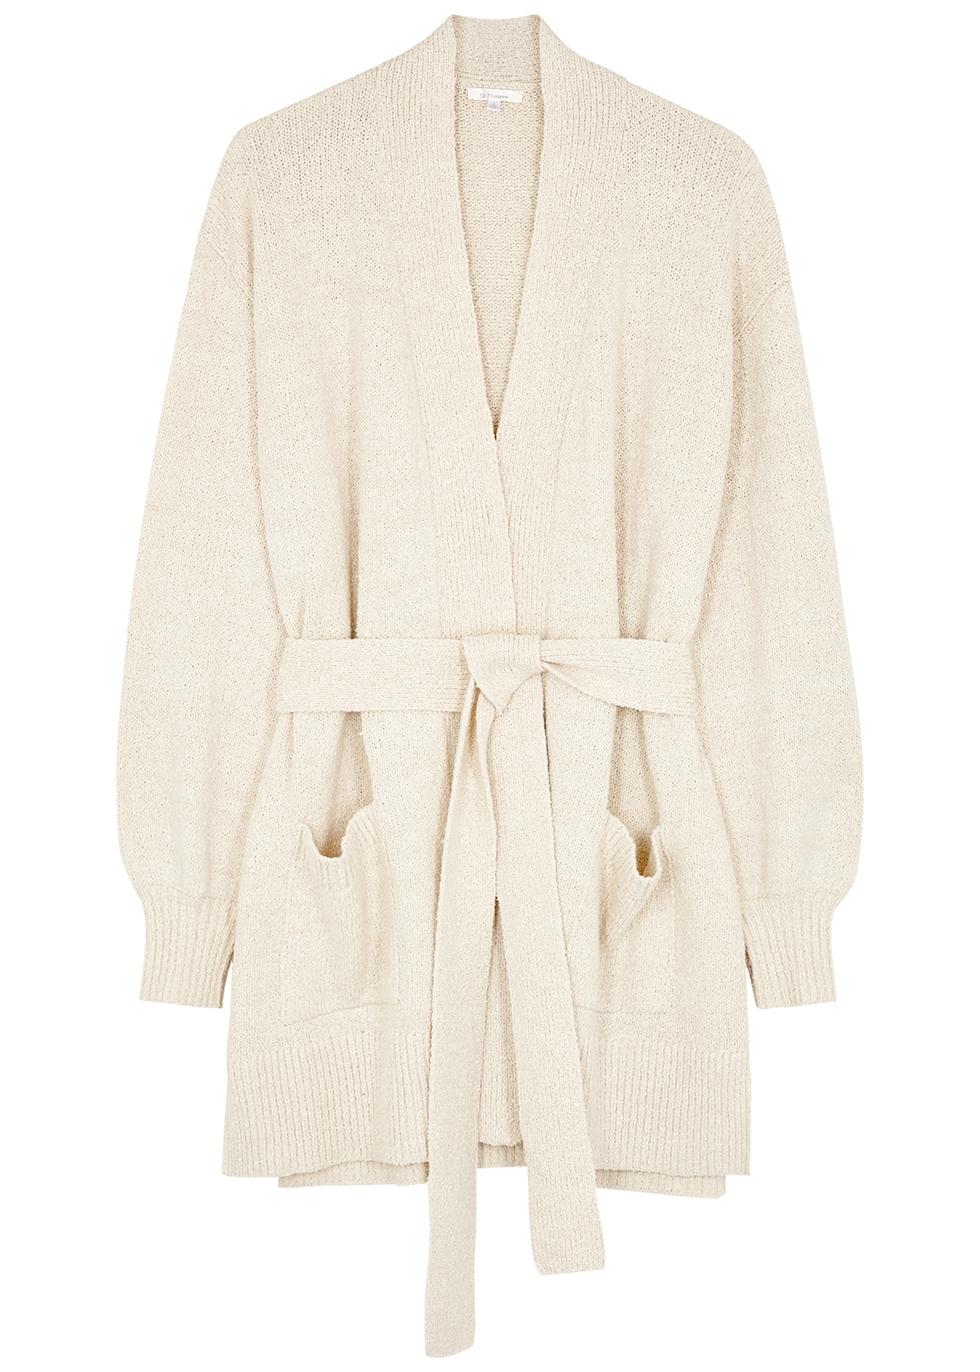 Marlee cream cotton-blend cardigan